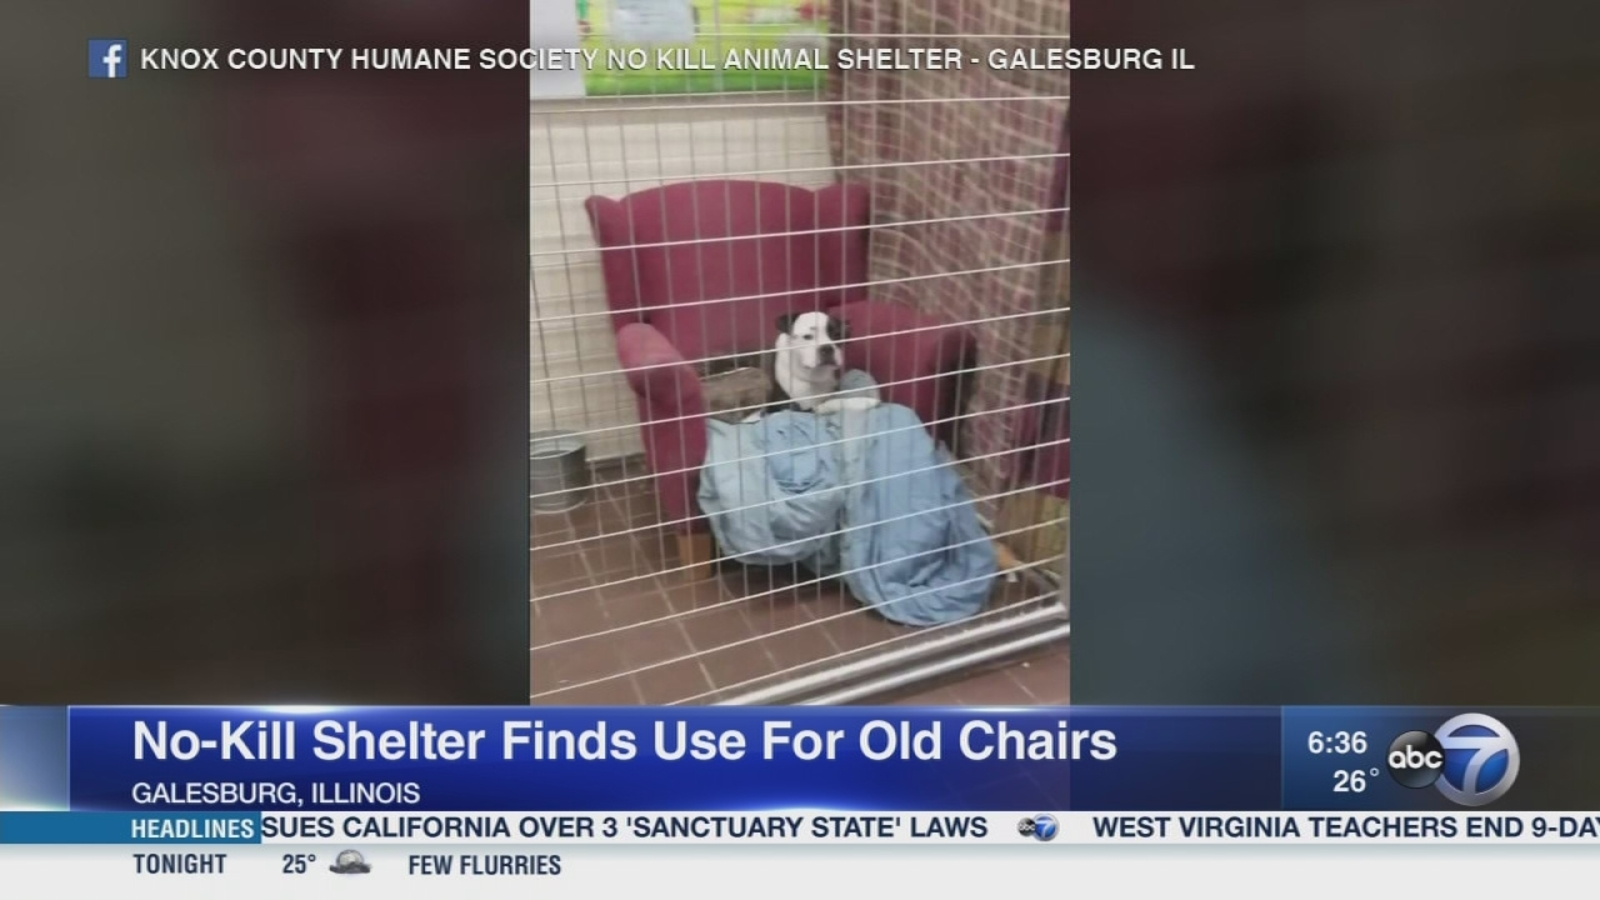 Pets Enjoy Donated Chairs At Illinois No Kill Shelter Abc11